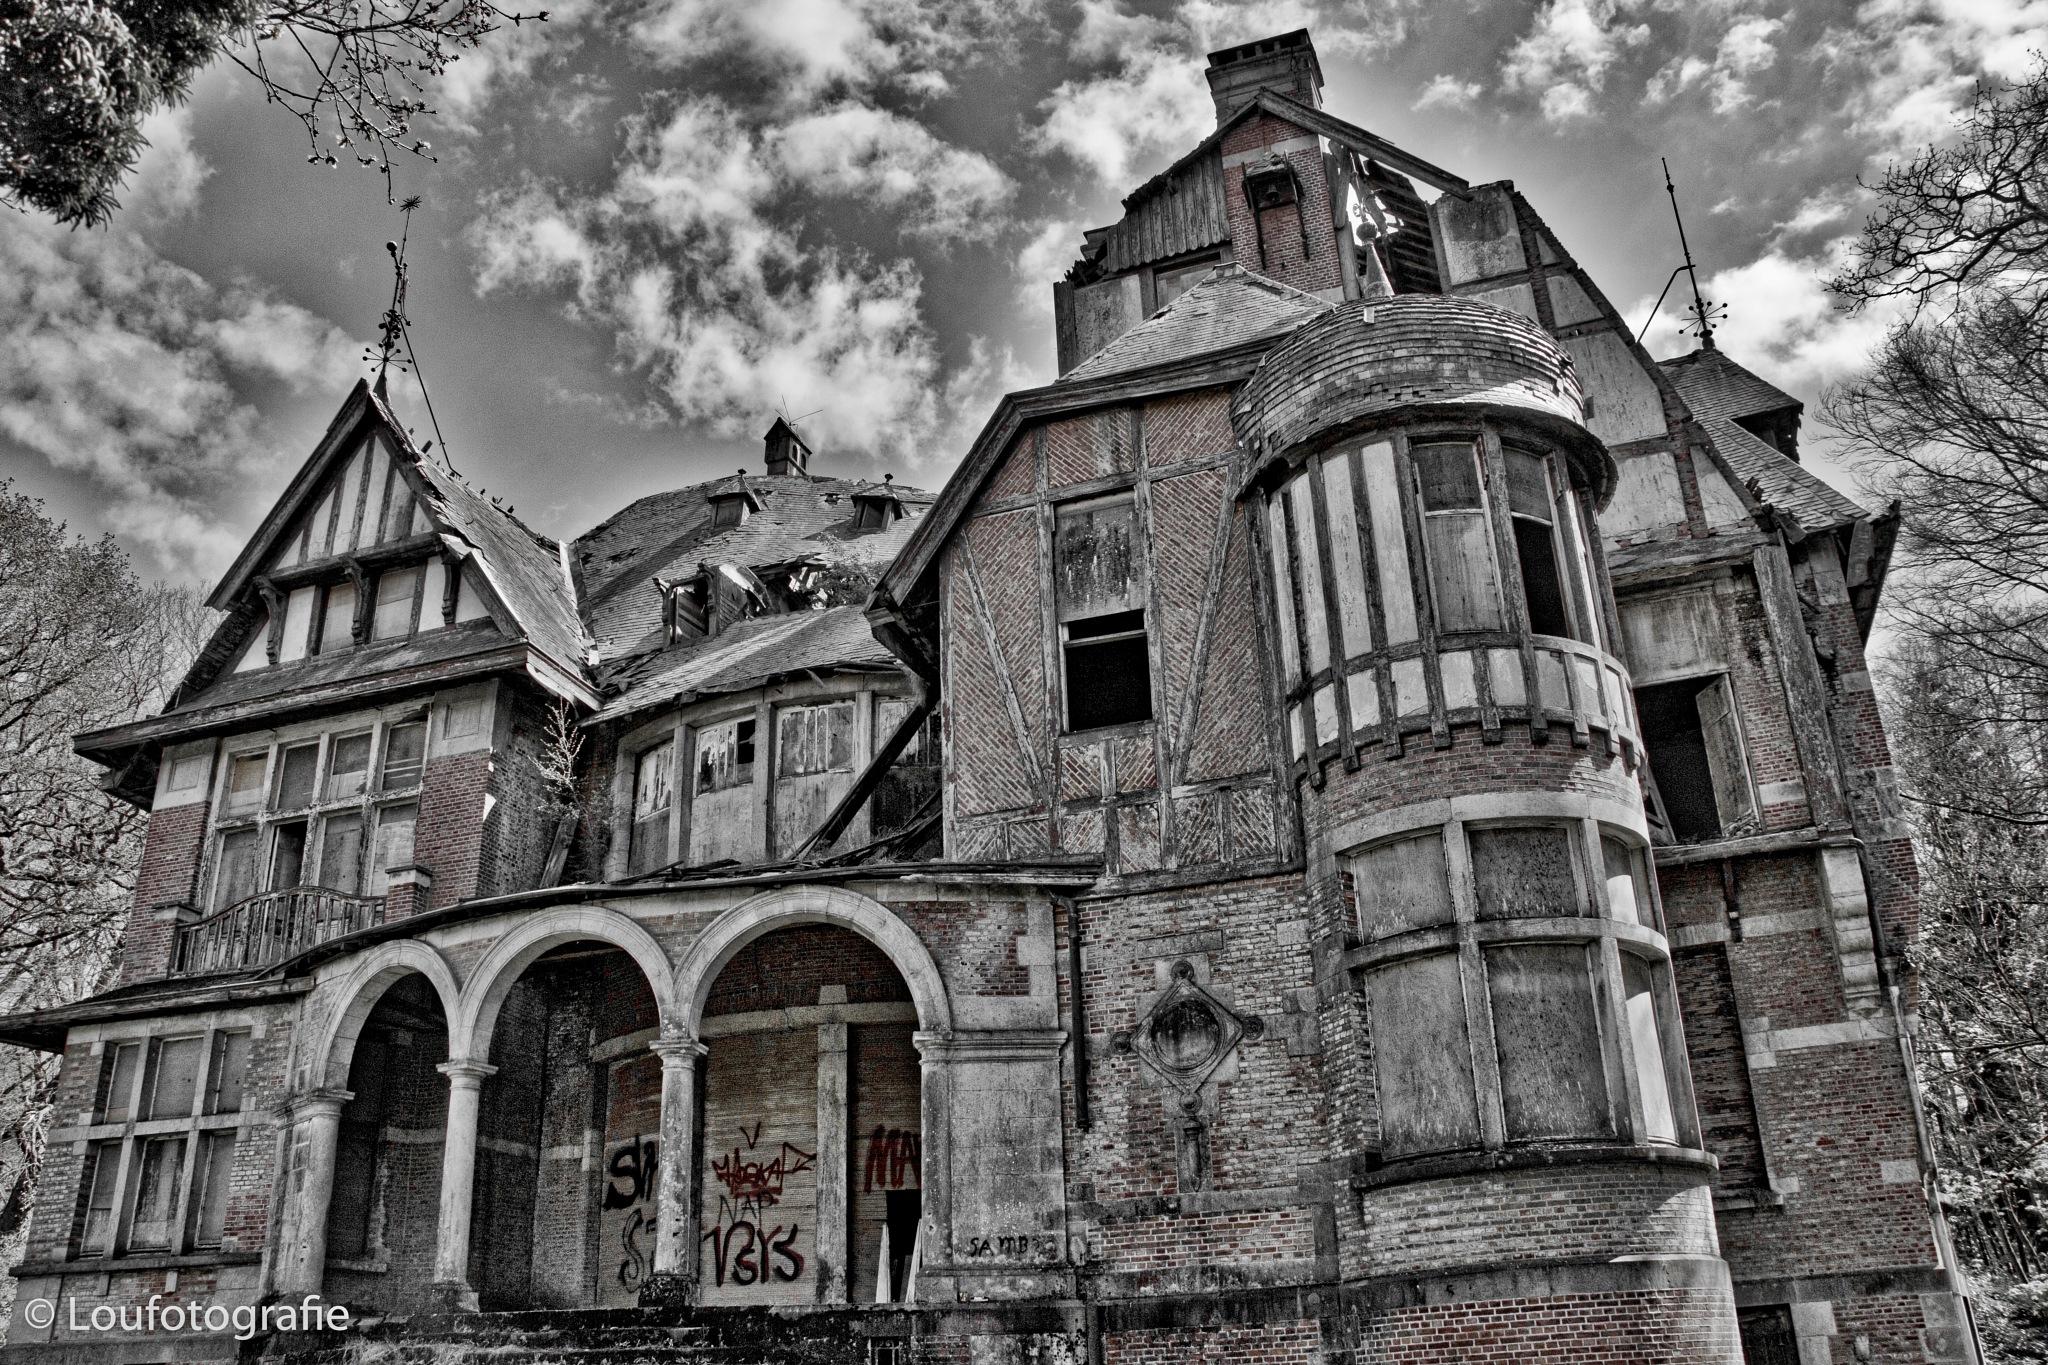 Chateau Nottebohm by Loufotografie